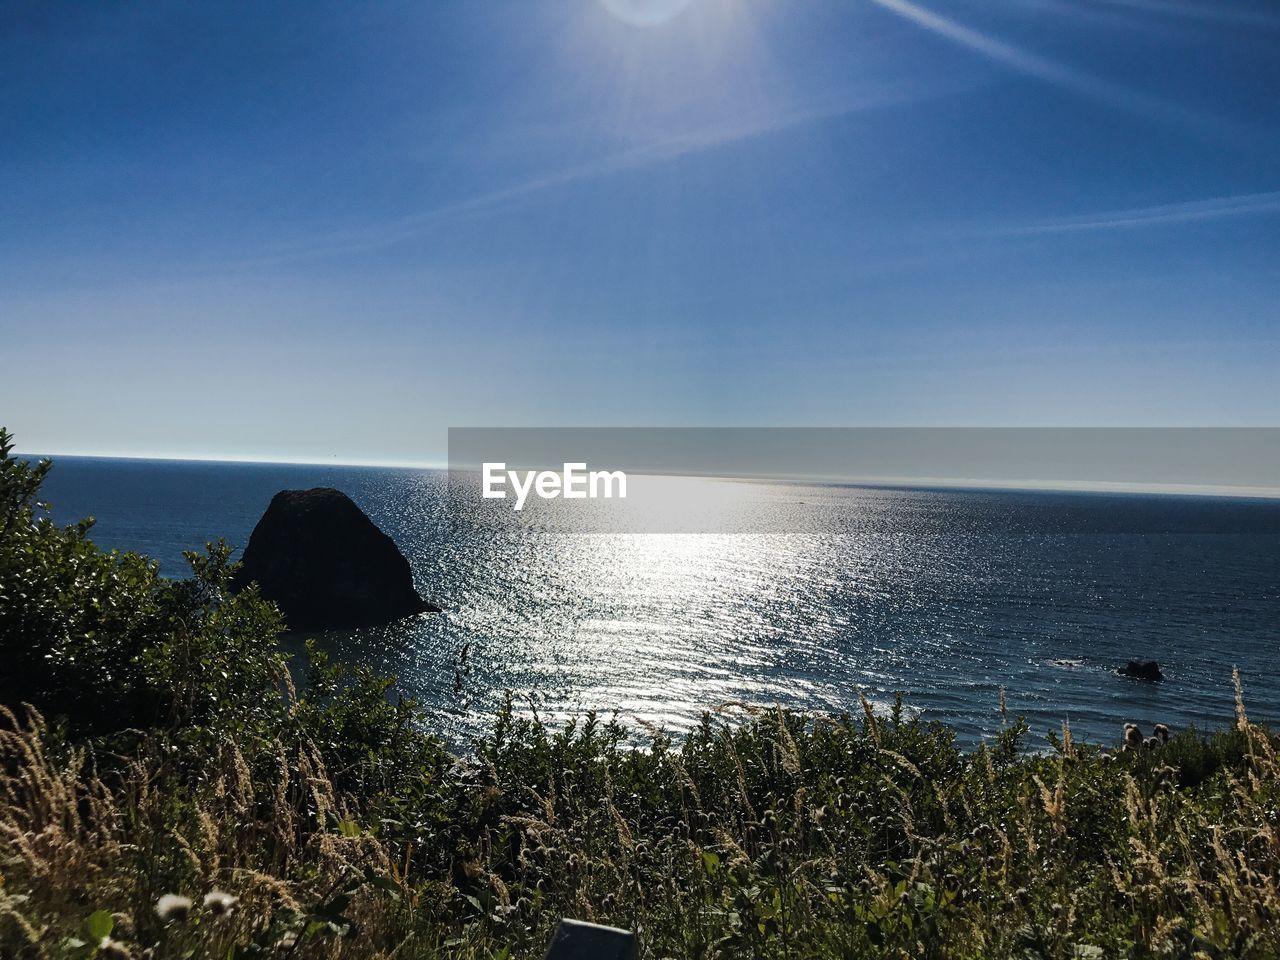 sea, water, scenics - nature, sky, horizon, horizon over water, beauty in nature, tranquility, tranquil scene, sunlight, plant, nature, day, land, no people, beach, idyllic, non-urban scene, sun, outdoors, lens flare